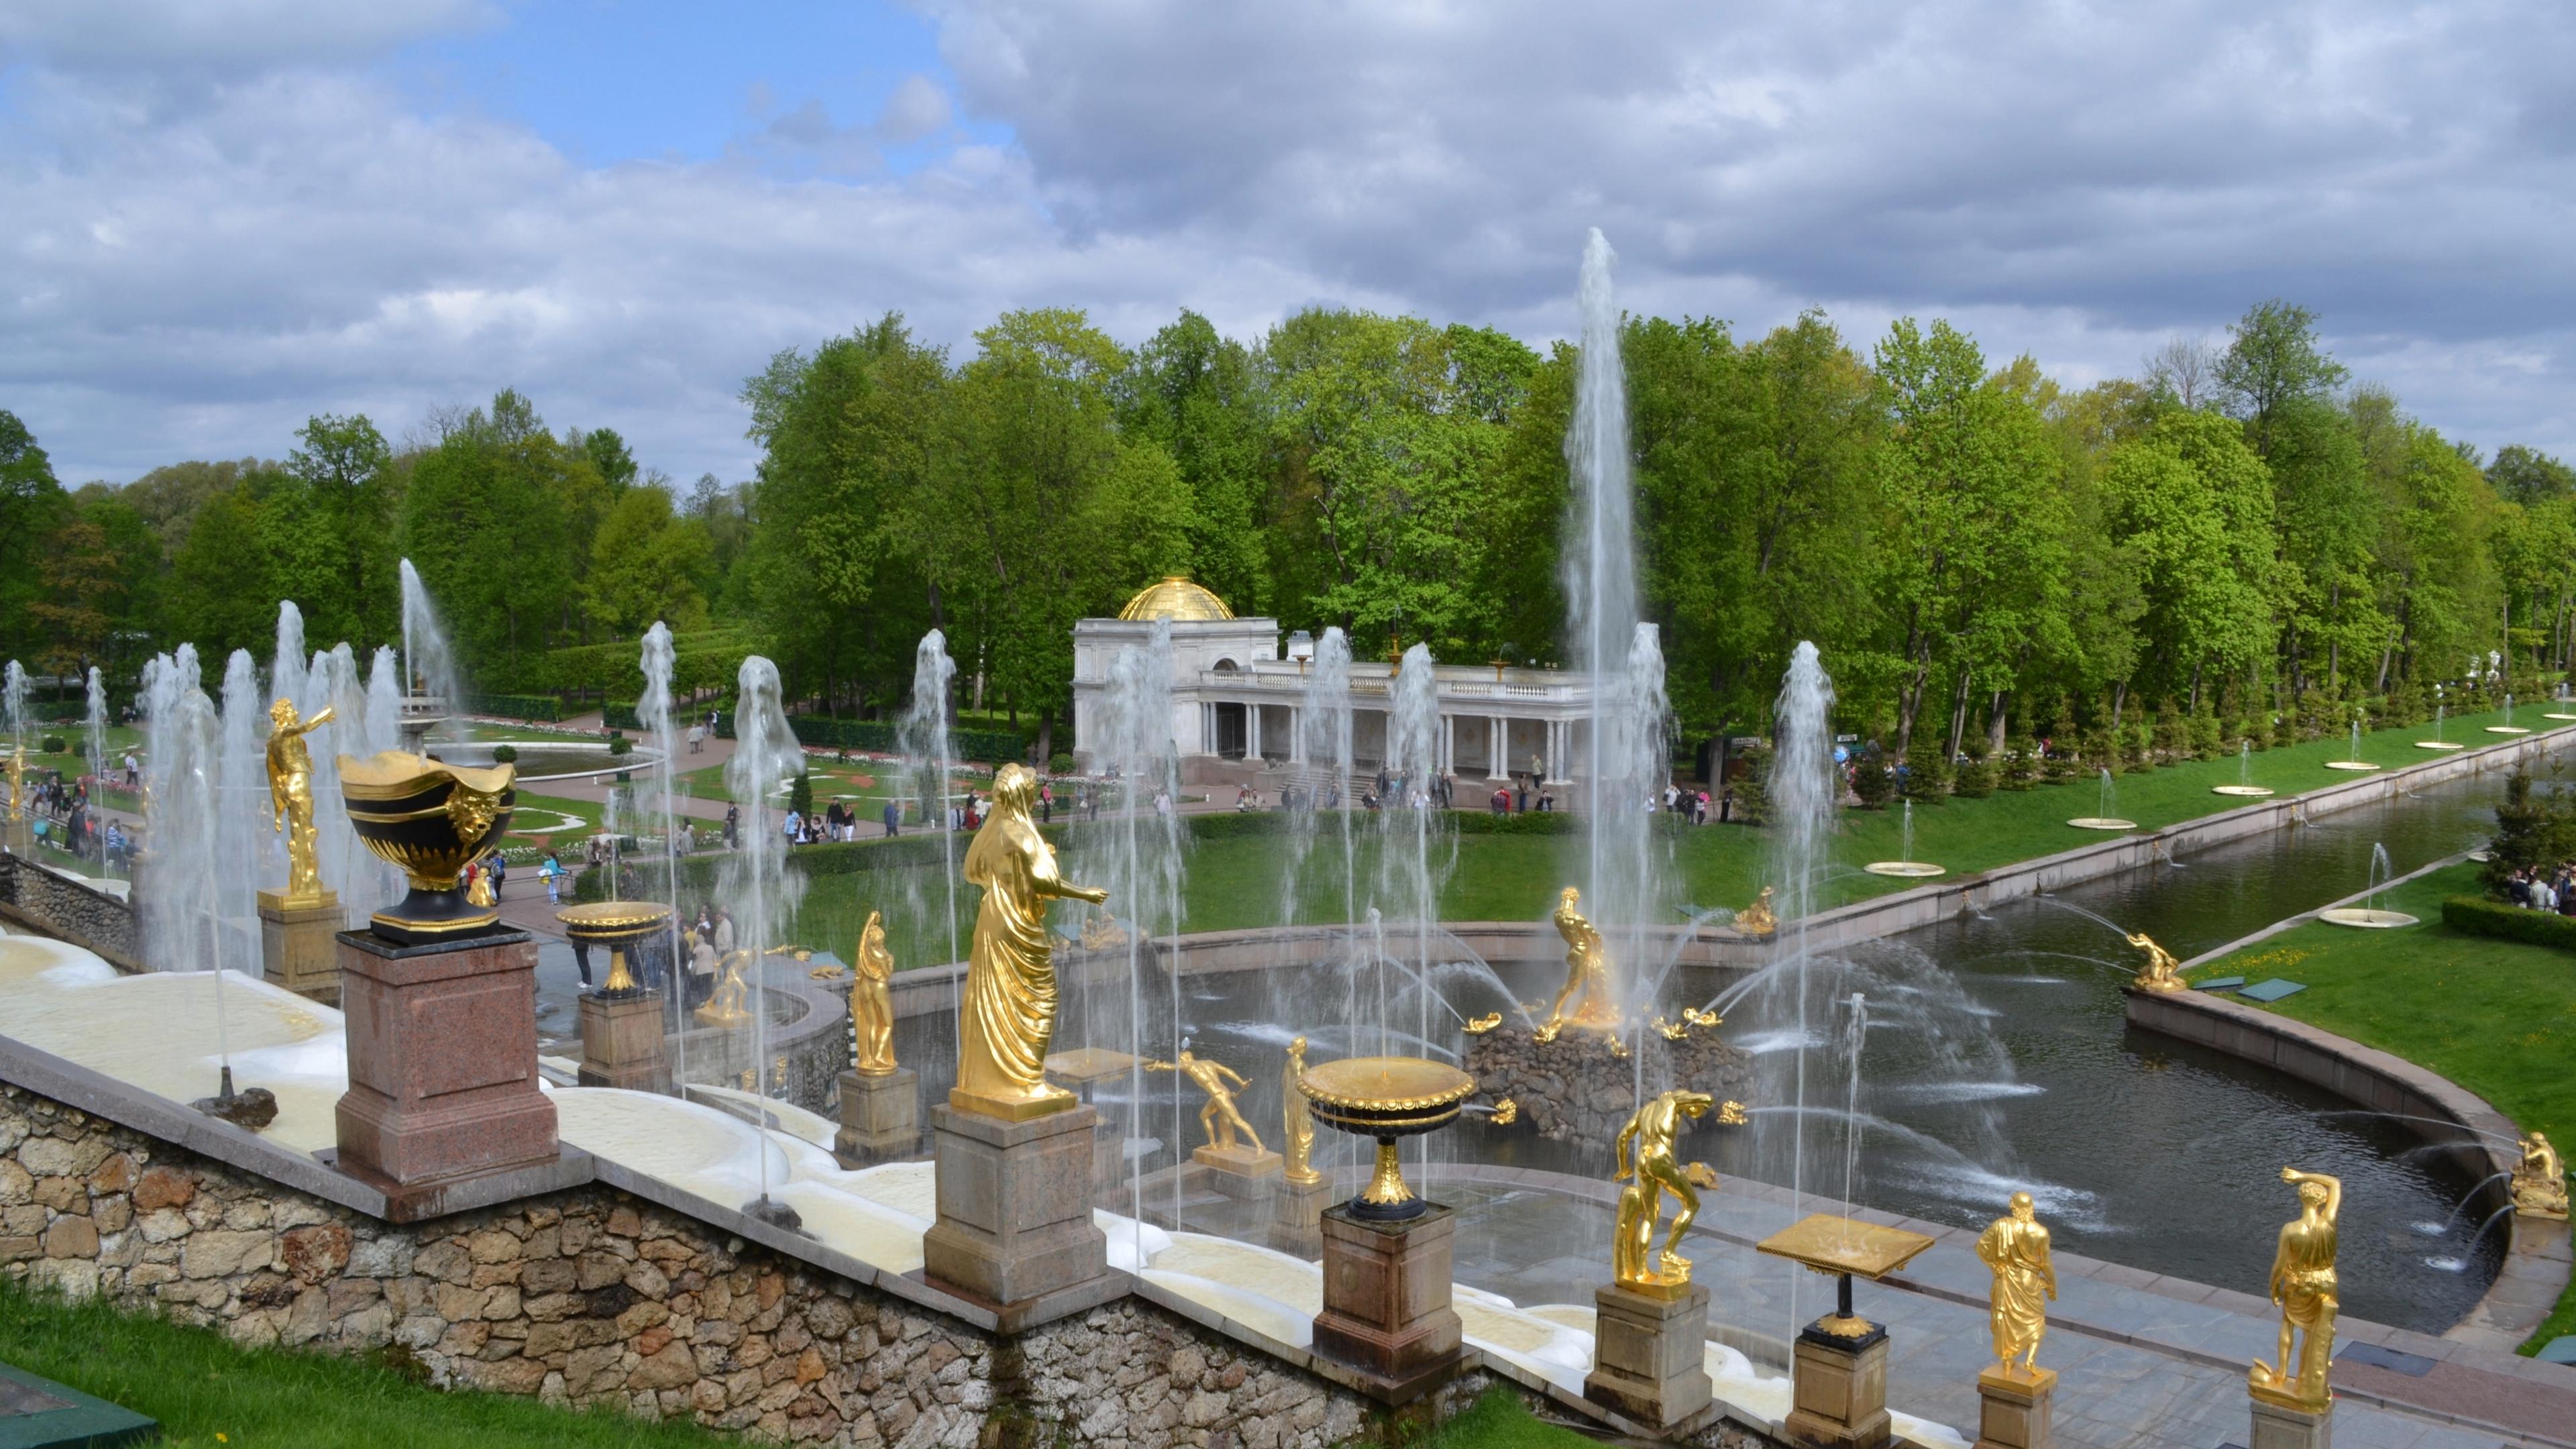 peterhof fountains park 4k 1538068819 - peterhof, fountains, park 4k - peterhof, Park, fountains